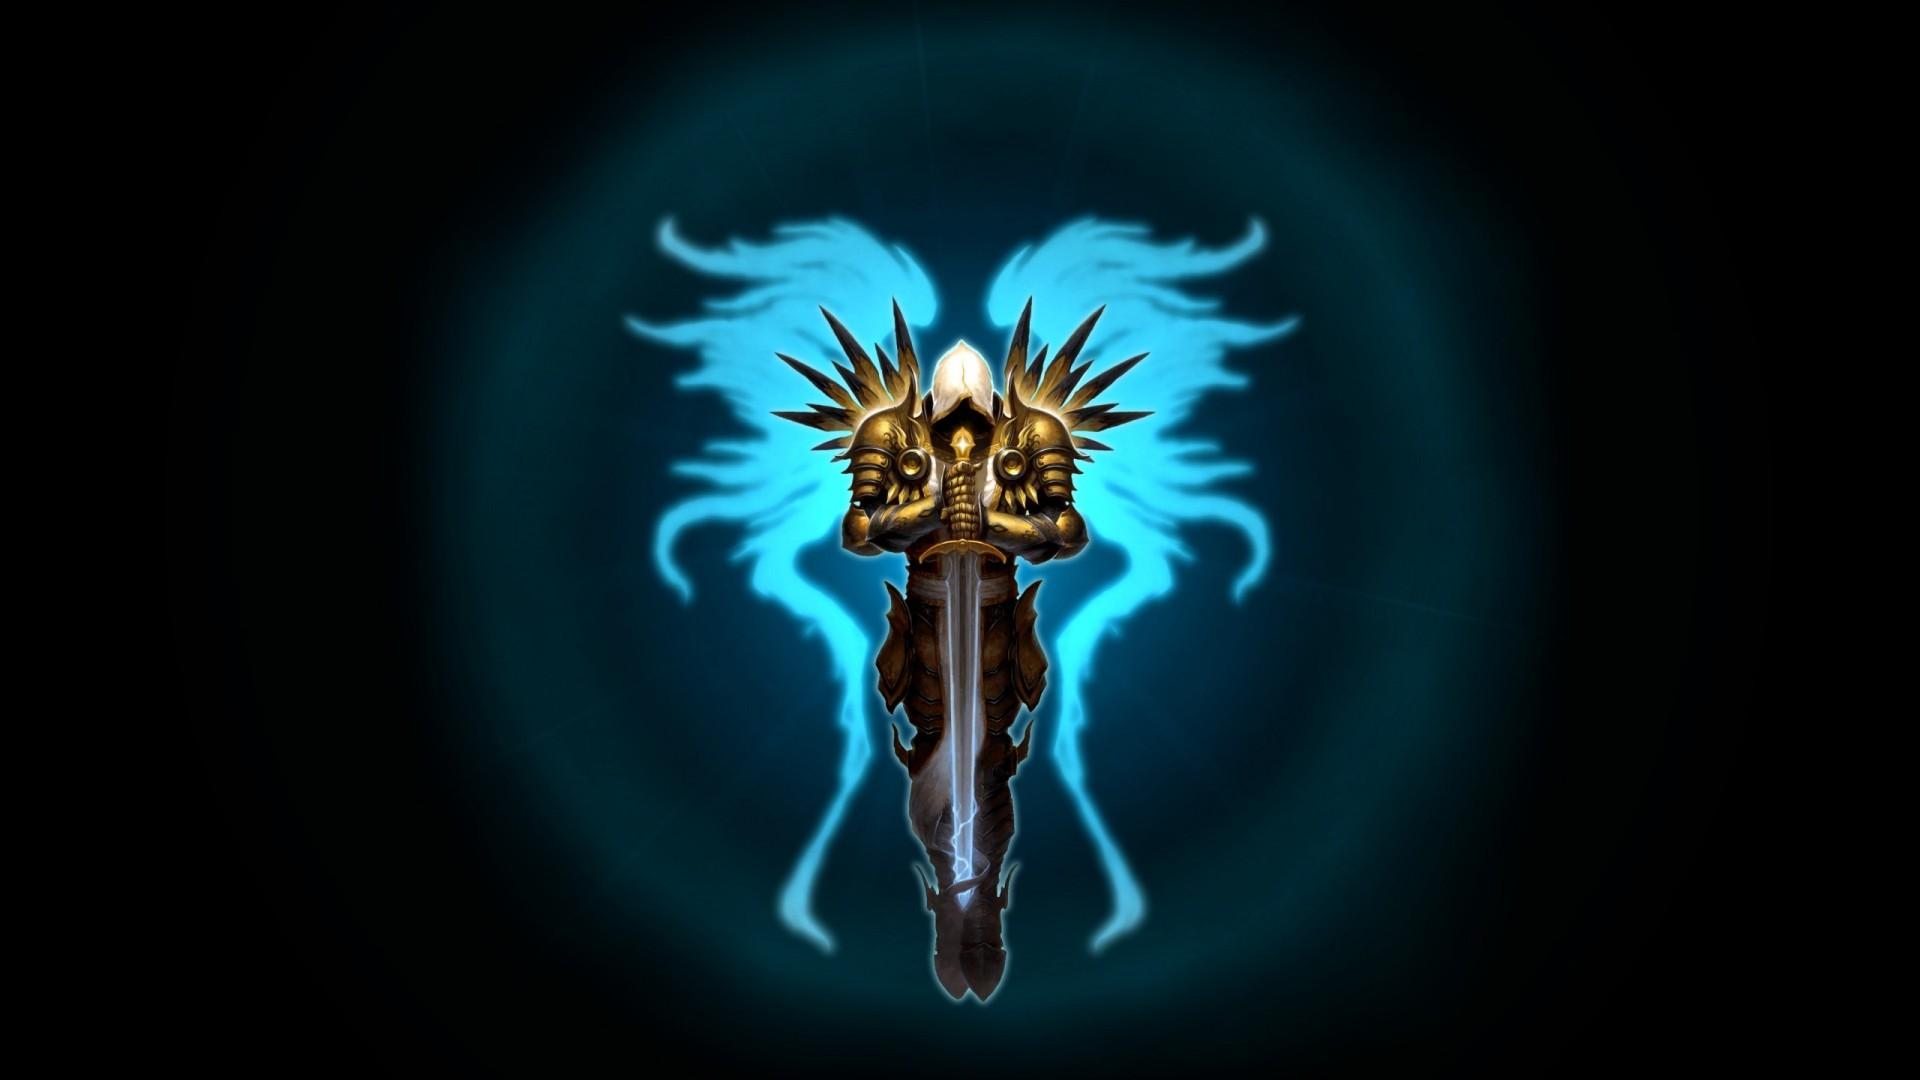 Diablo Wallpaper ·① Download Free Beautiful High